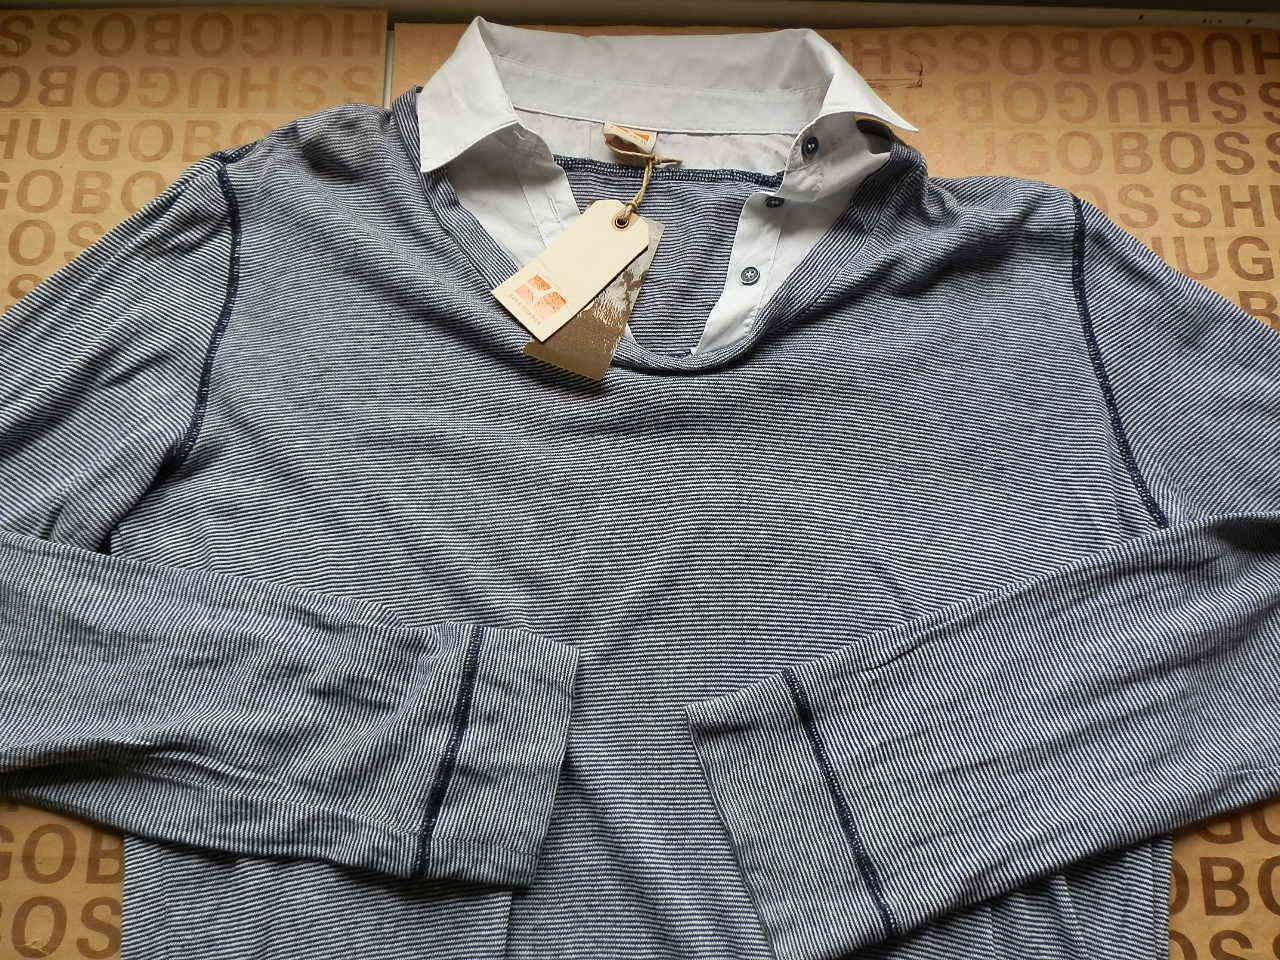 NUOVO HUGO BOSS A Righe Da Uomo Grigio Knitwear Knitwear Knitwear Sweater Cardigan Camicia 2 In 1 XL 775507